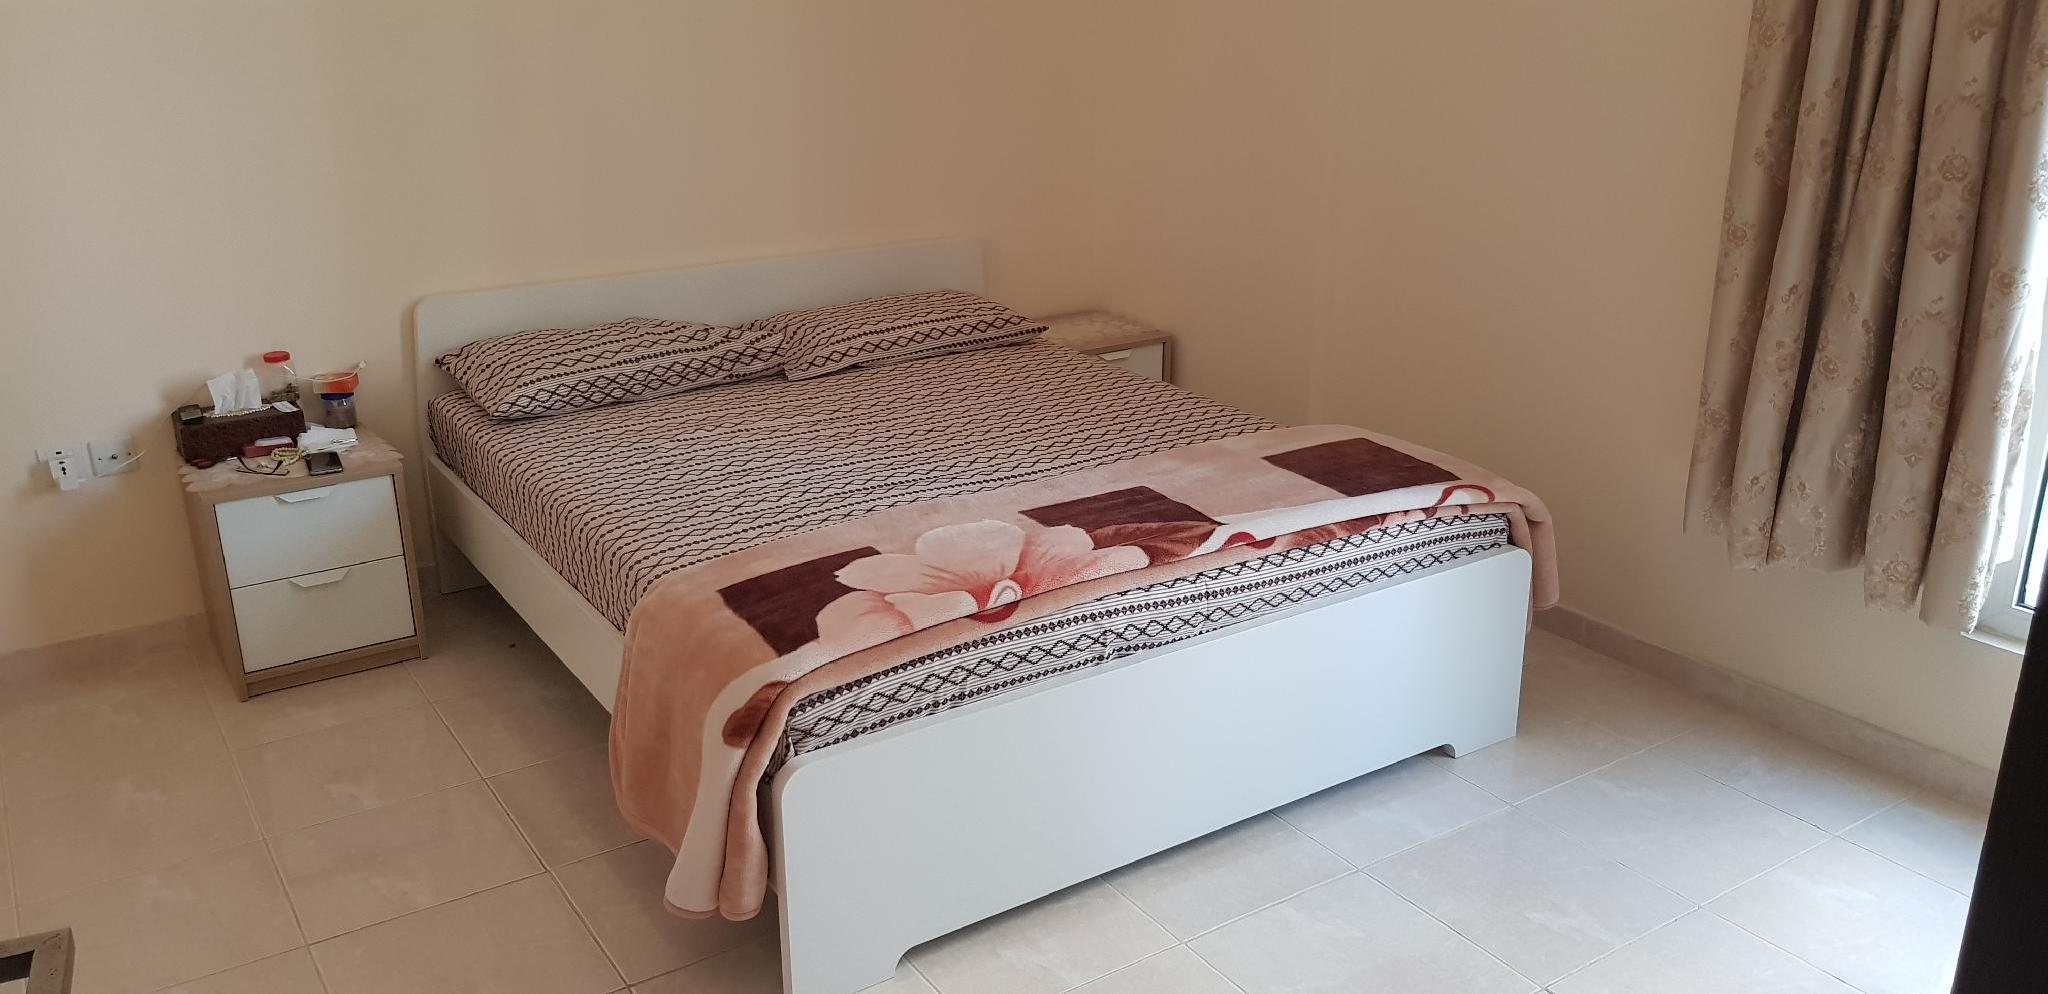 Spacious Comfortable Room    200+Reviews